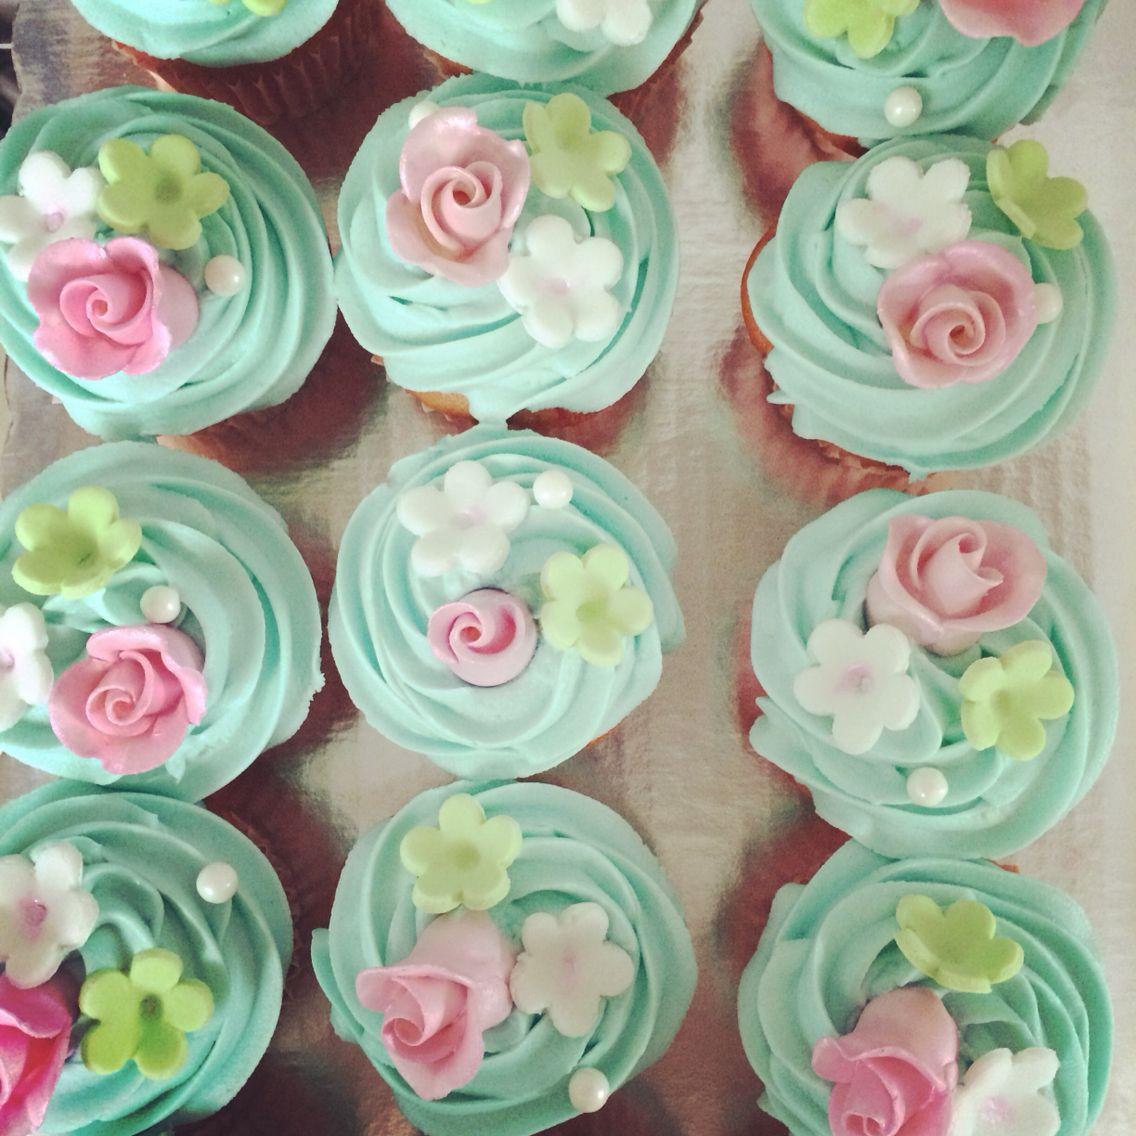 Cupcakes con flor de fondant!